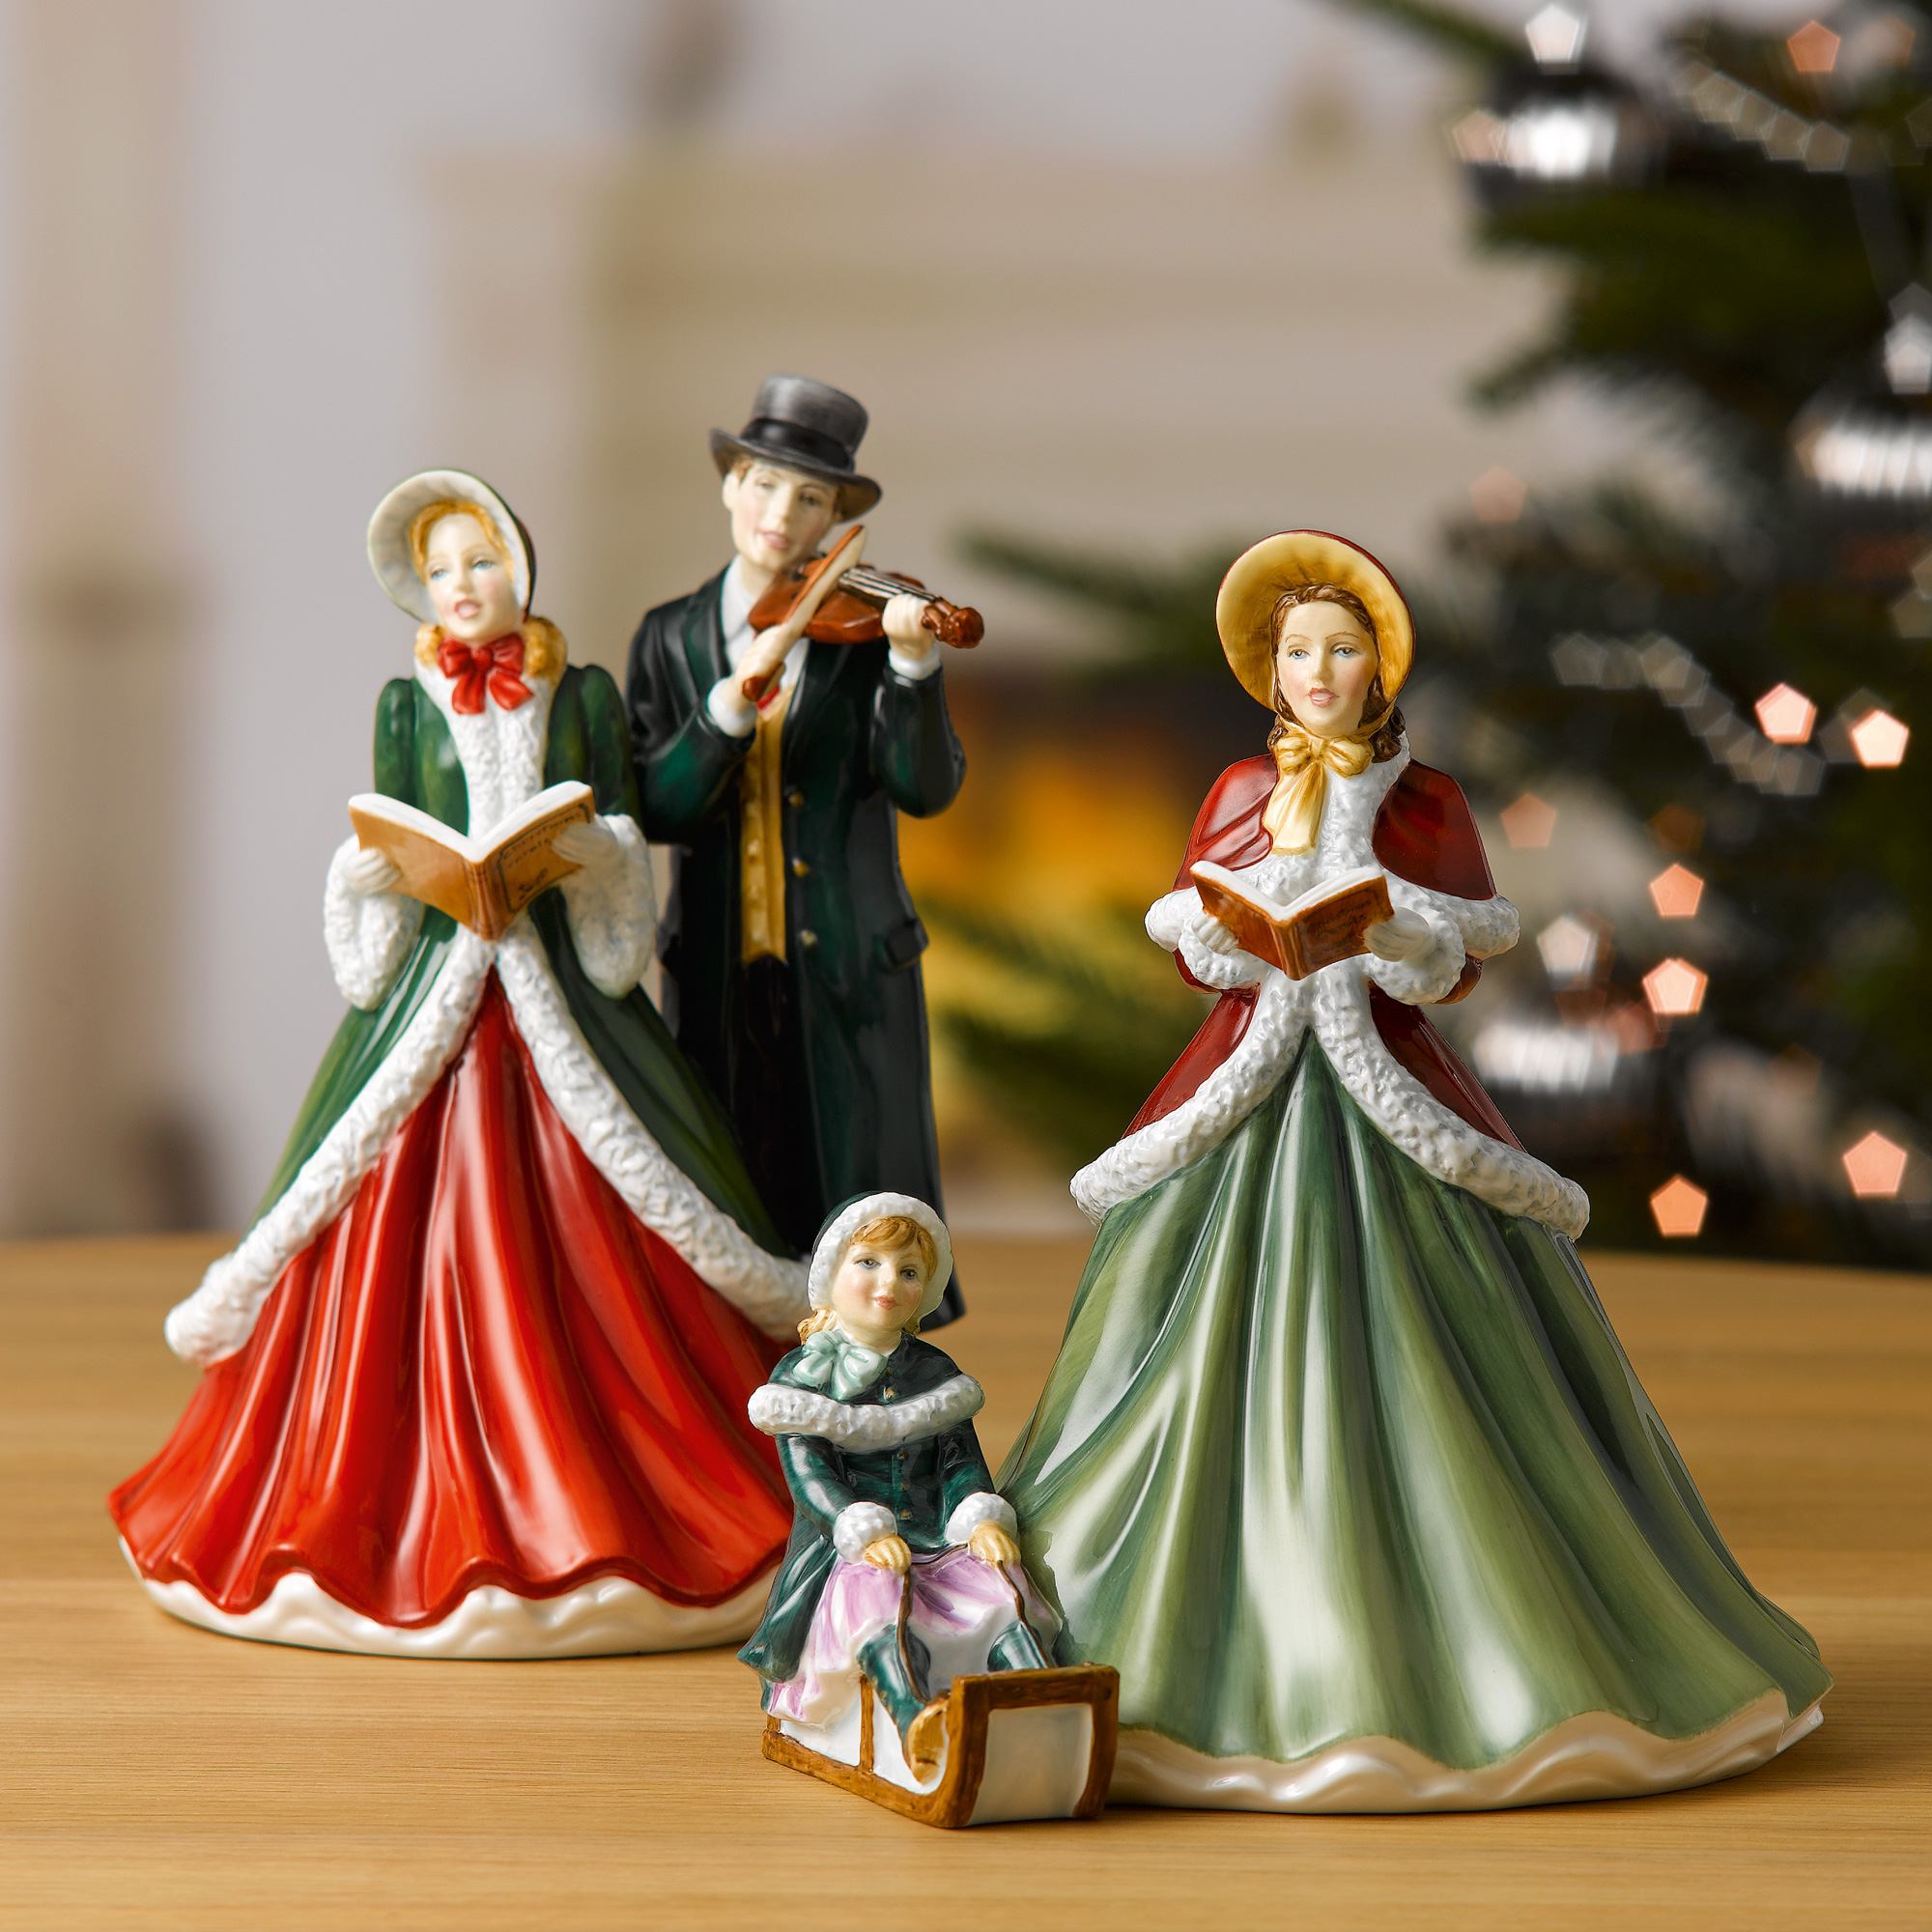 Christmas Carol Singers Figurines.I Heard The Bells On Christmas Day Hn5858 Royal Doulton Figurine